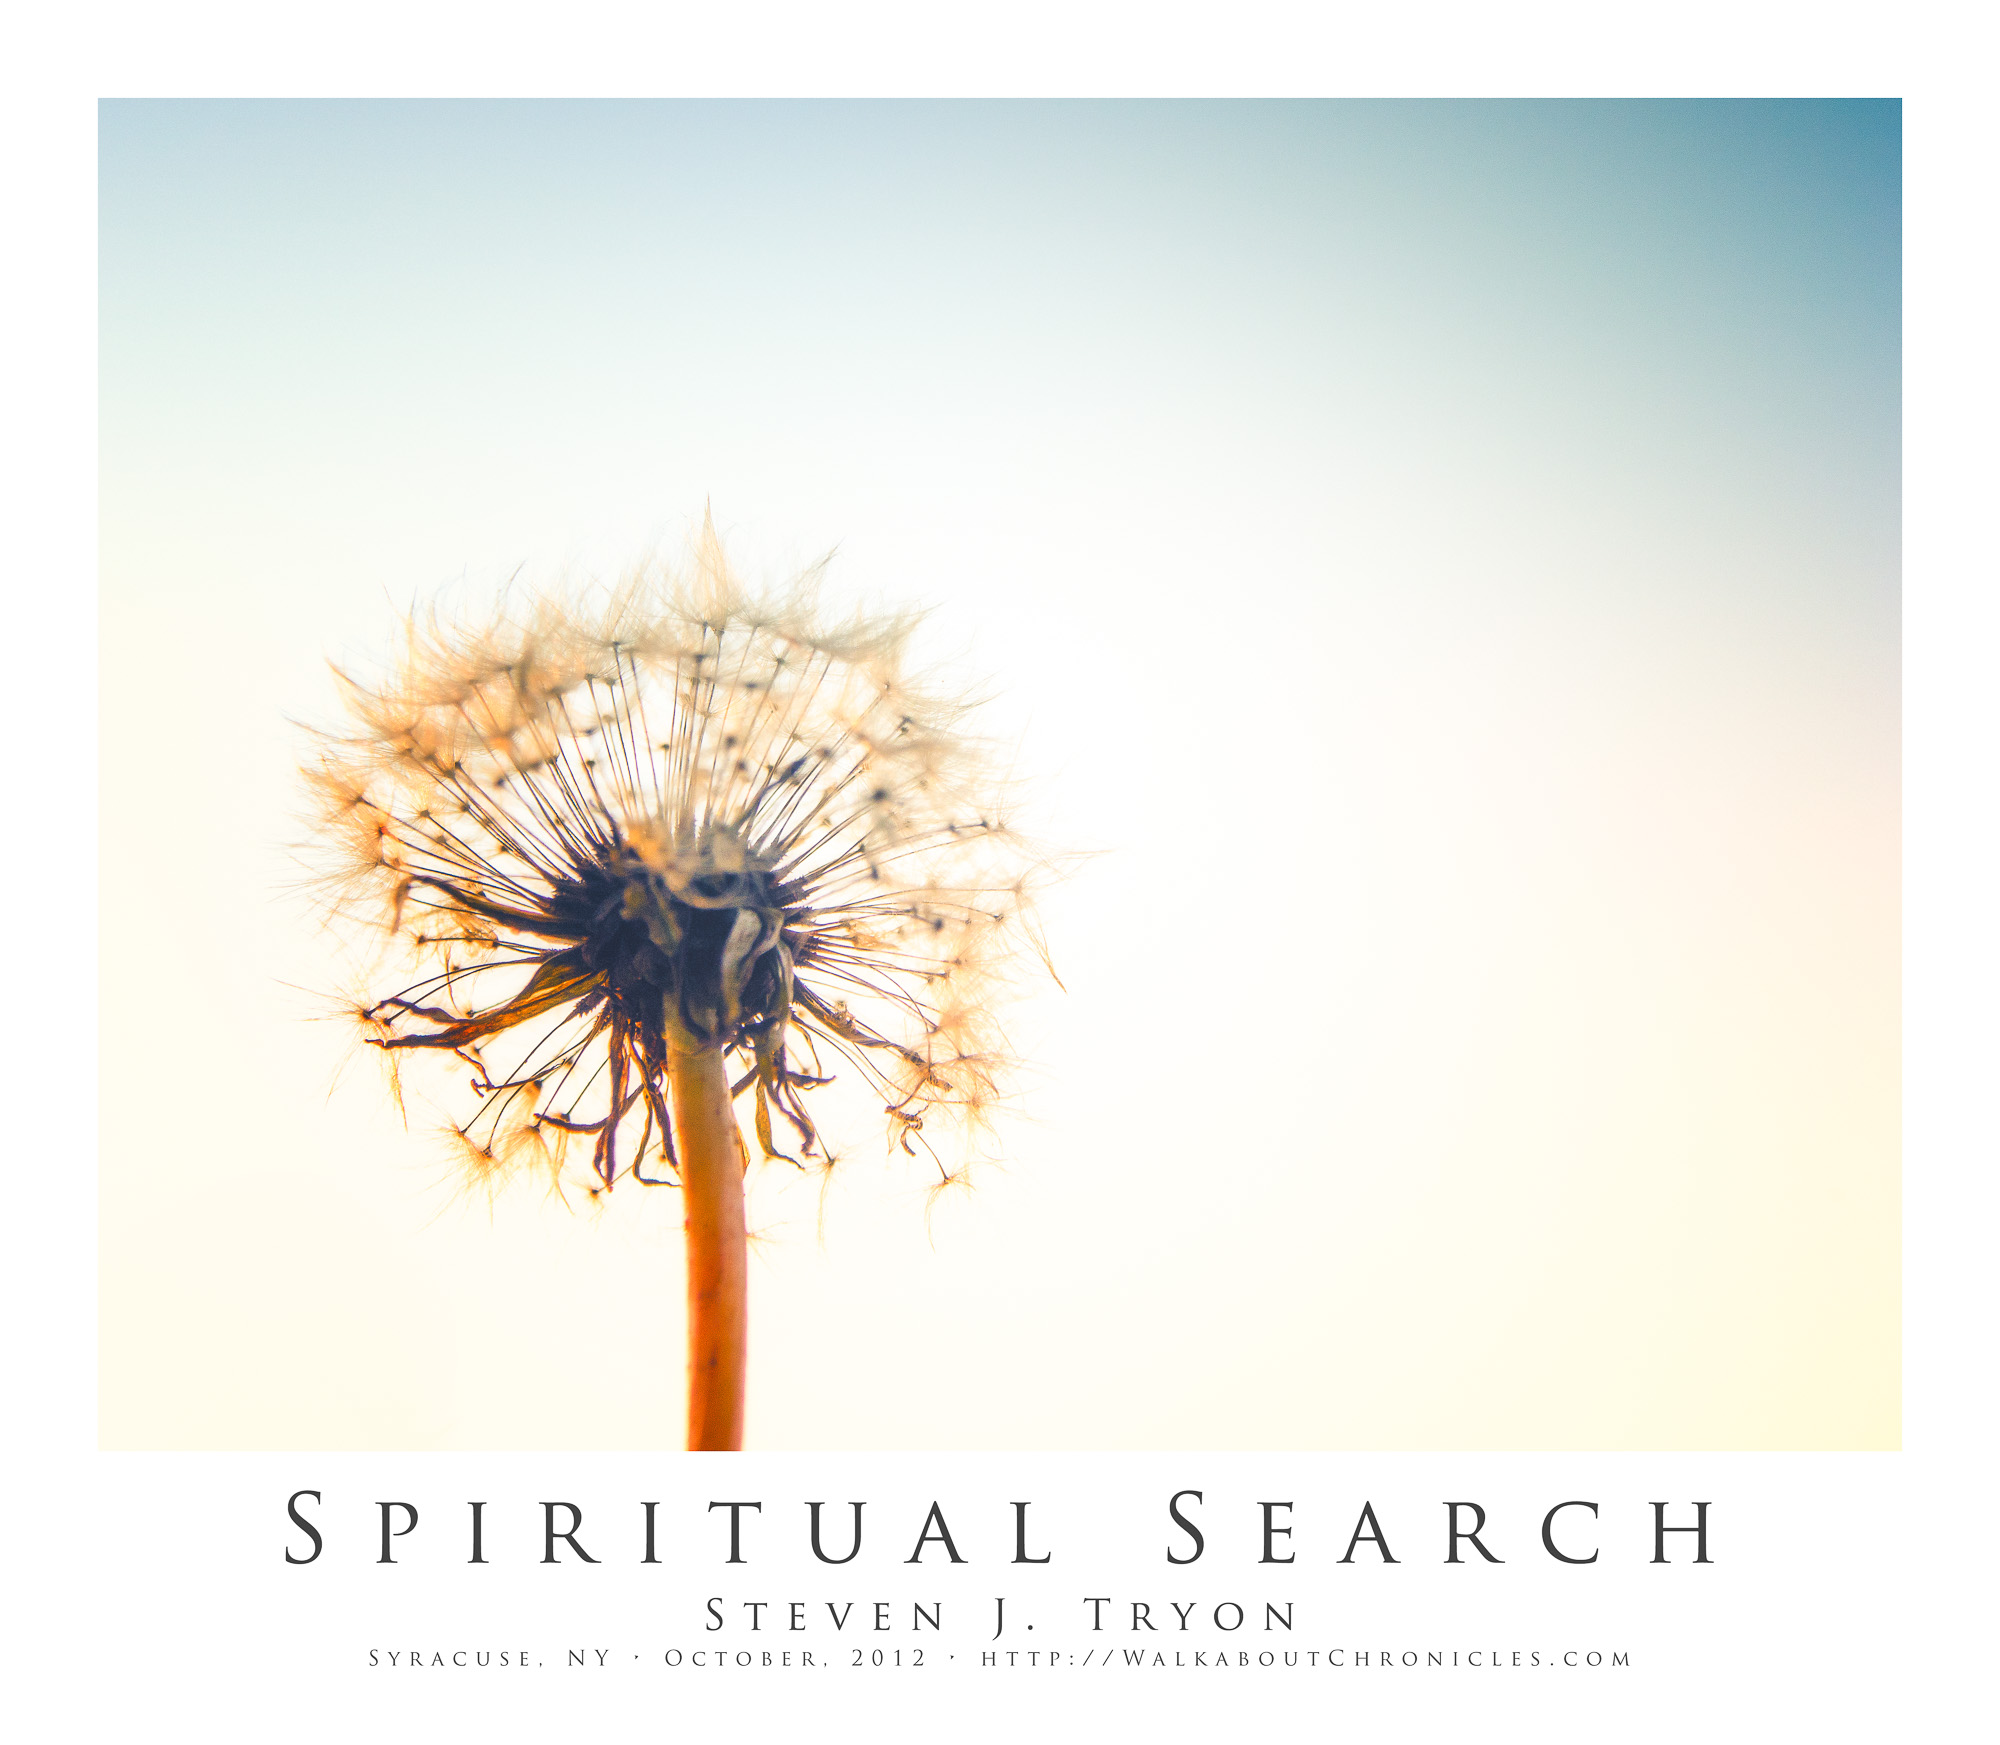 Spiritual Search